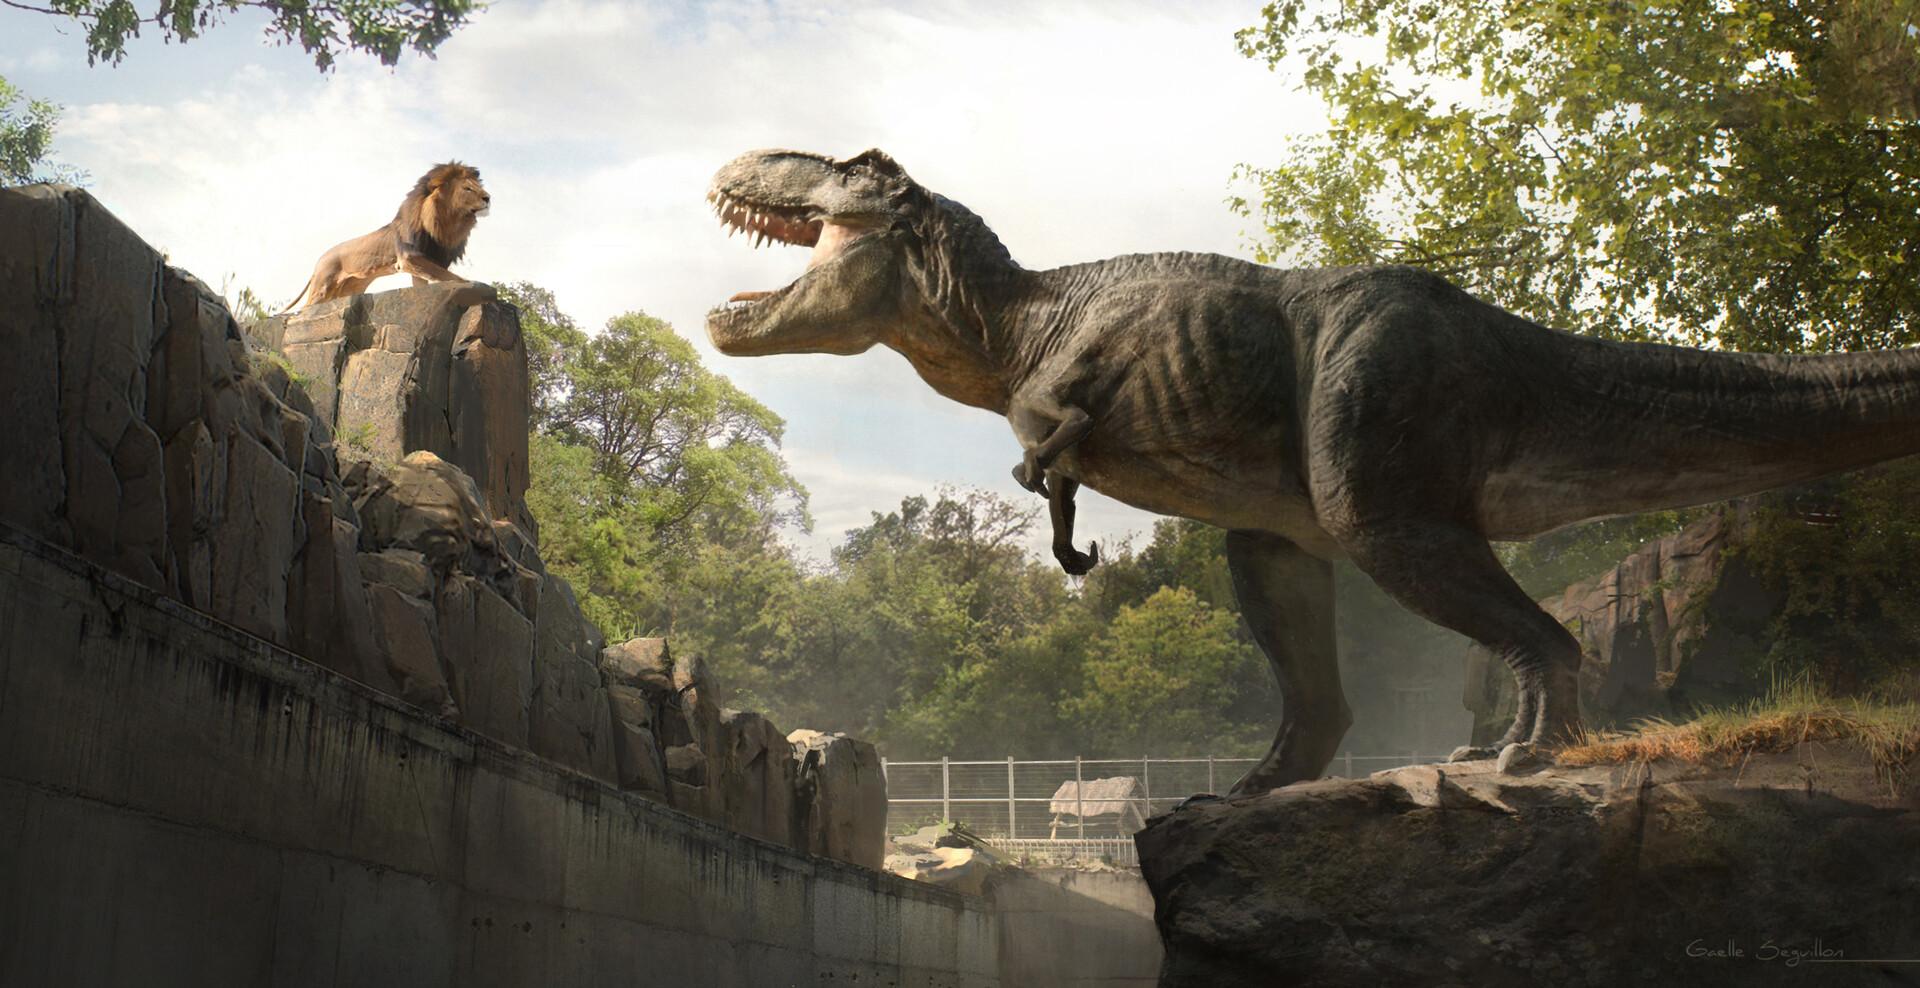 Vidéo : Interview de Gaëlle Seguillon, concept artist sur Jurassic World, Ready Player One...